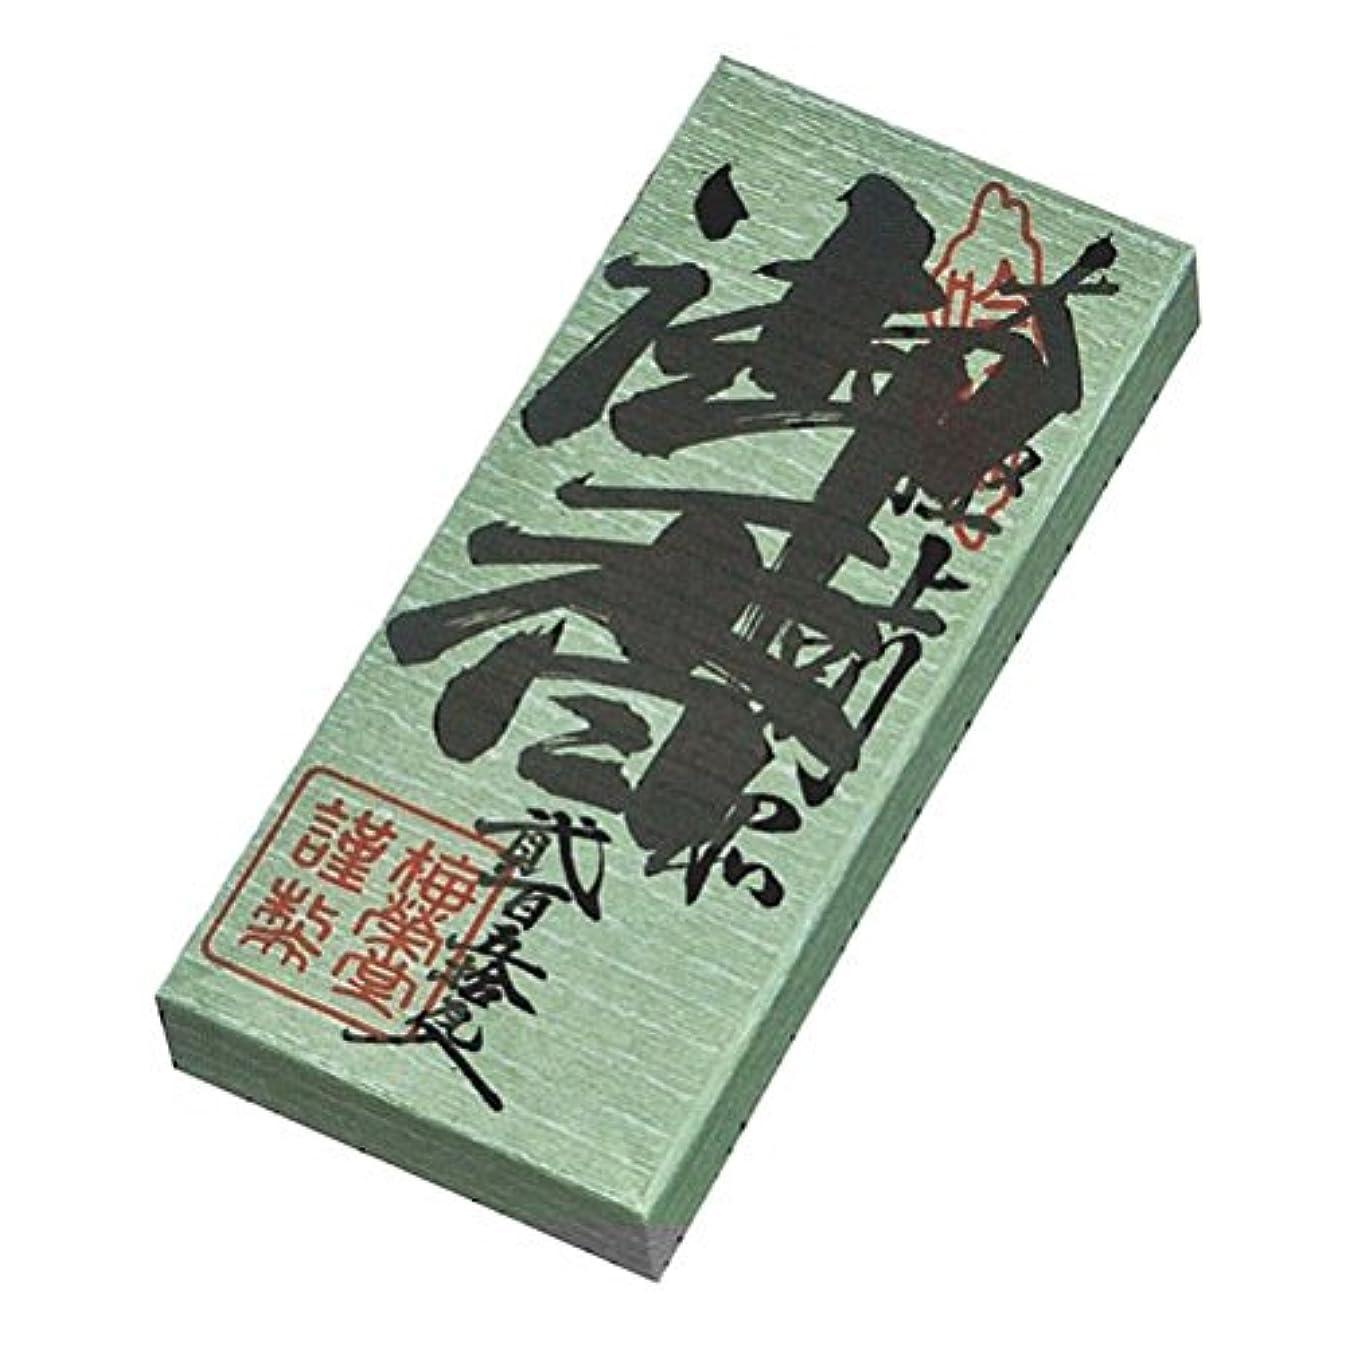 極上薫昇印 250g 紙箱入り お焼香 梅栄堂